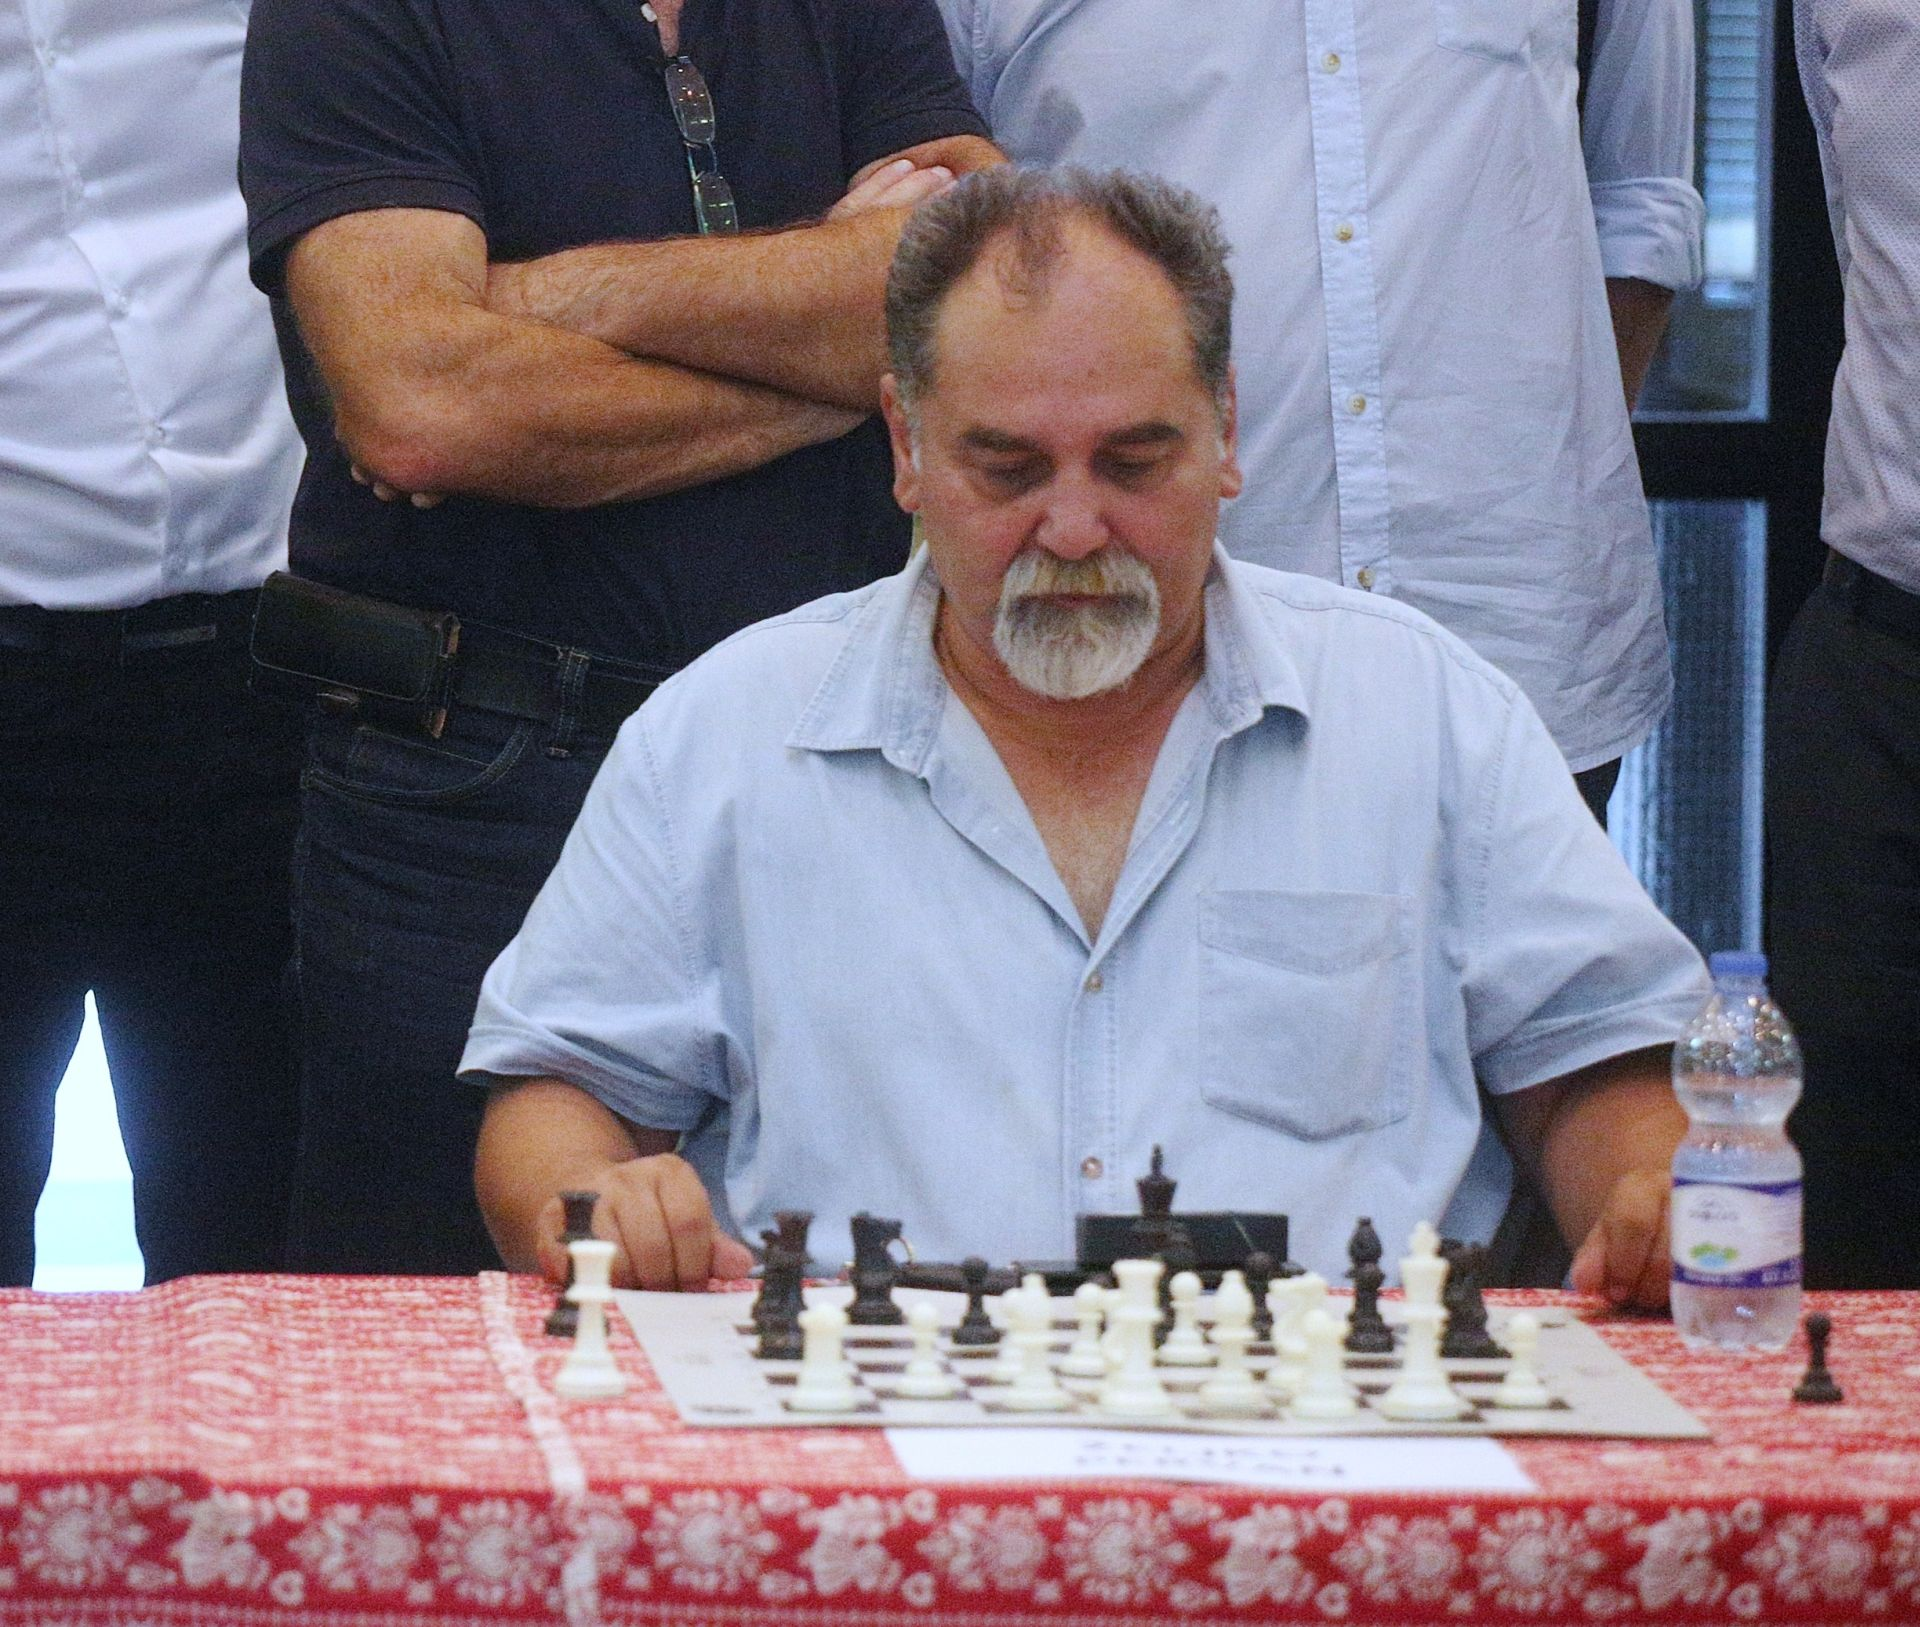 SP šah: Carlsen i Caruana remizirali u prvoj partiji